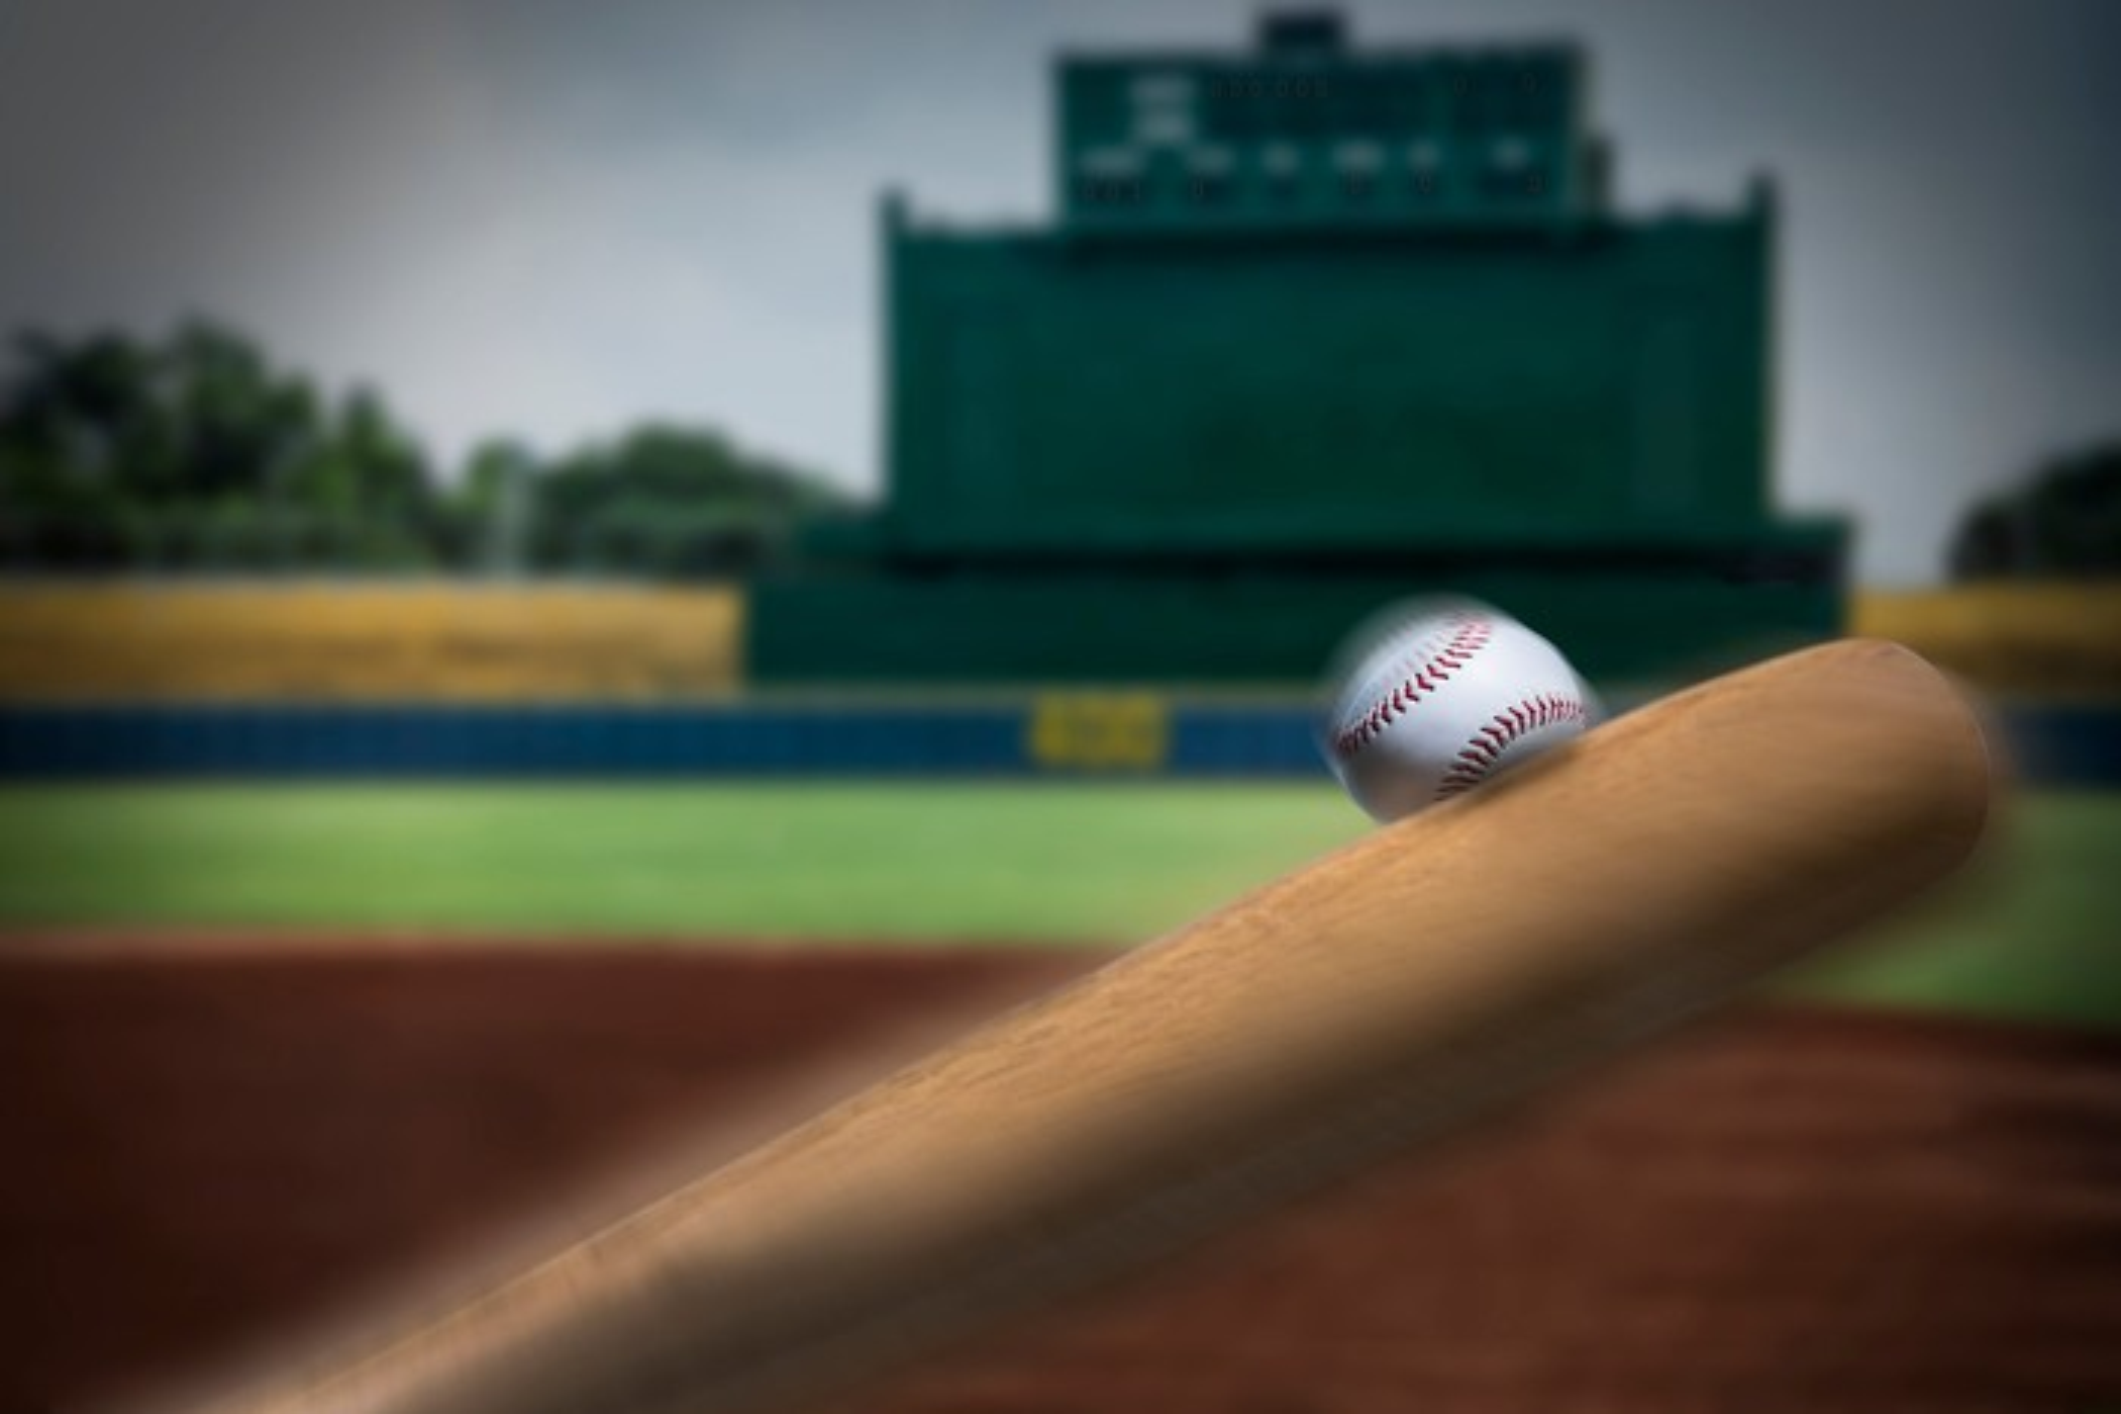 A baseball bat hitting a ball.